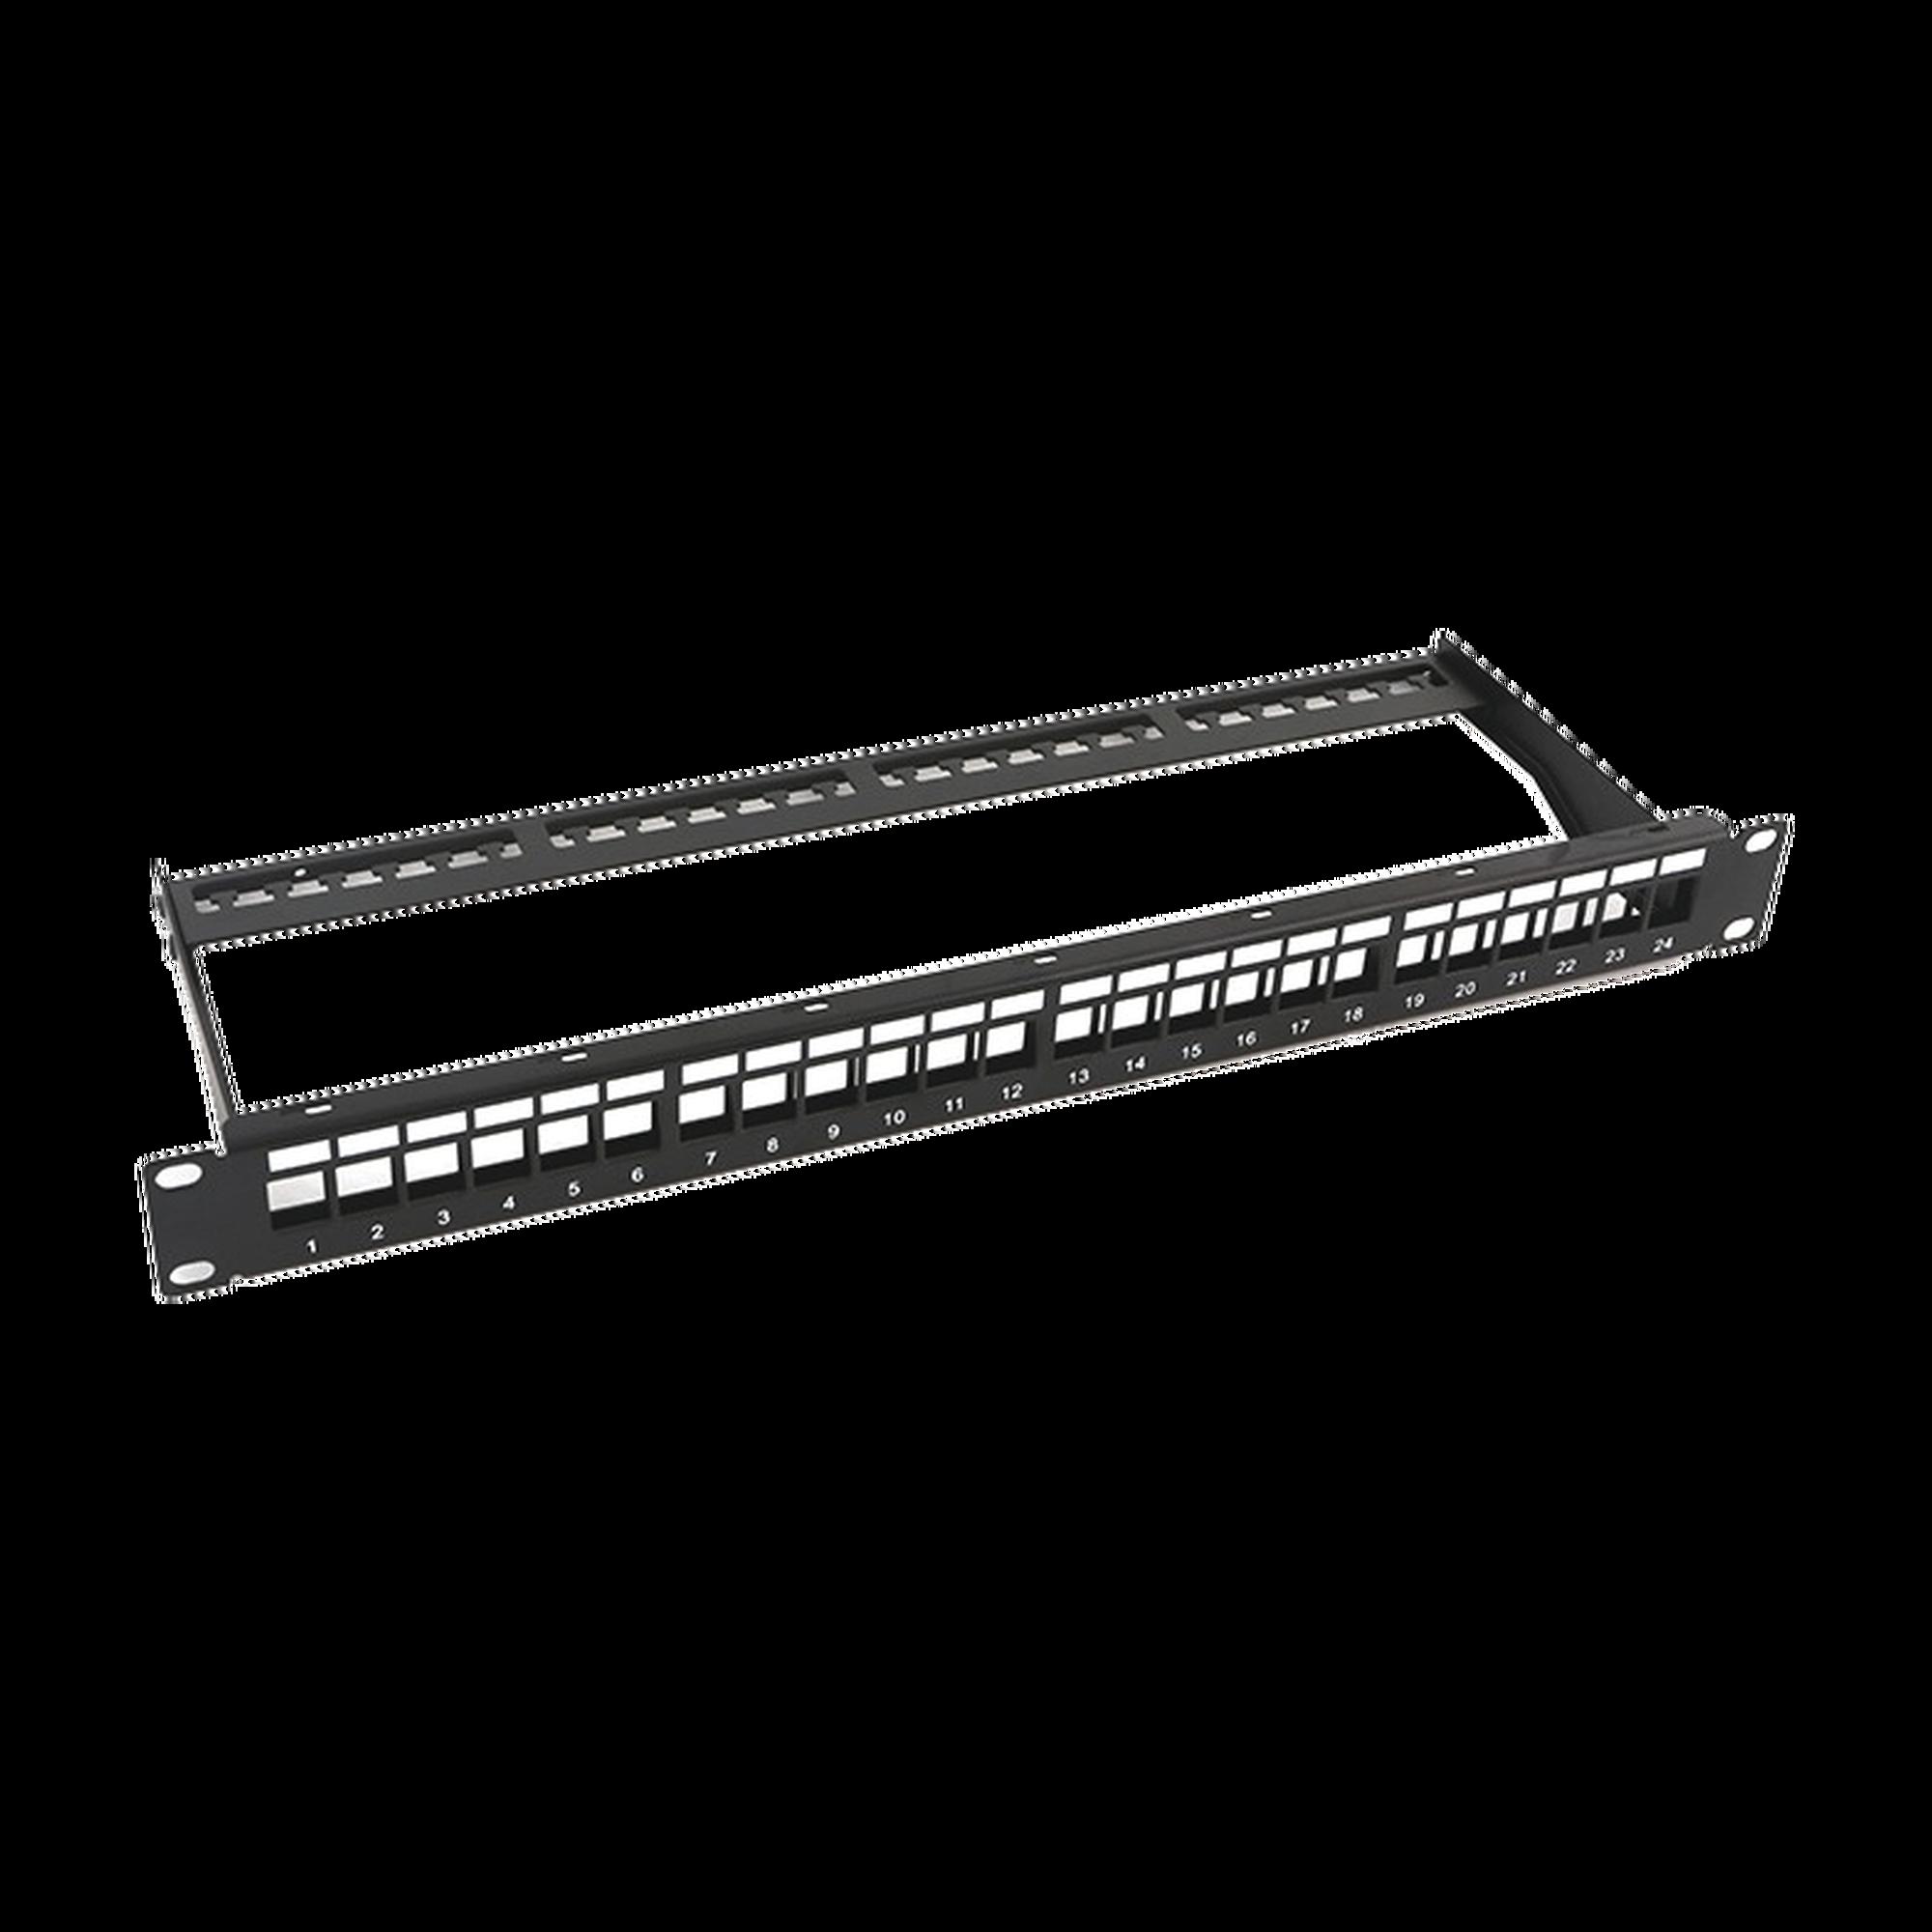 Patch panel modular sin blindaje de 24 puertos, 1U, con barra para organizar cable